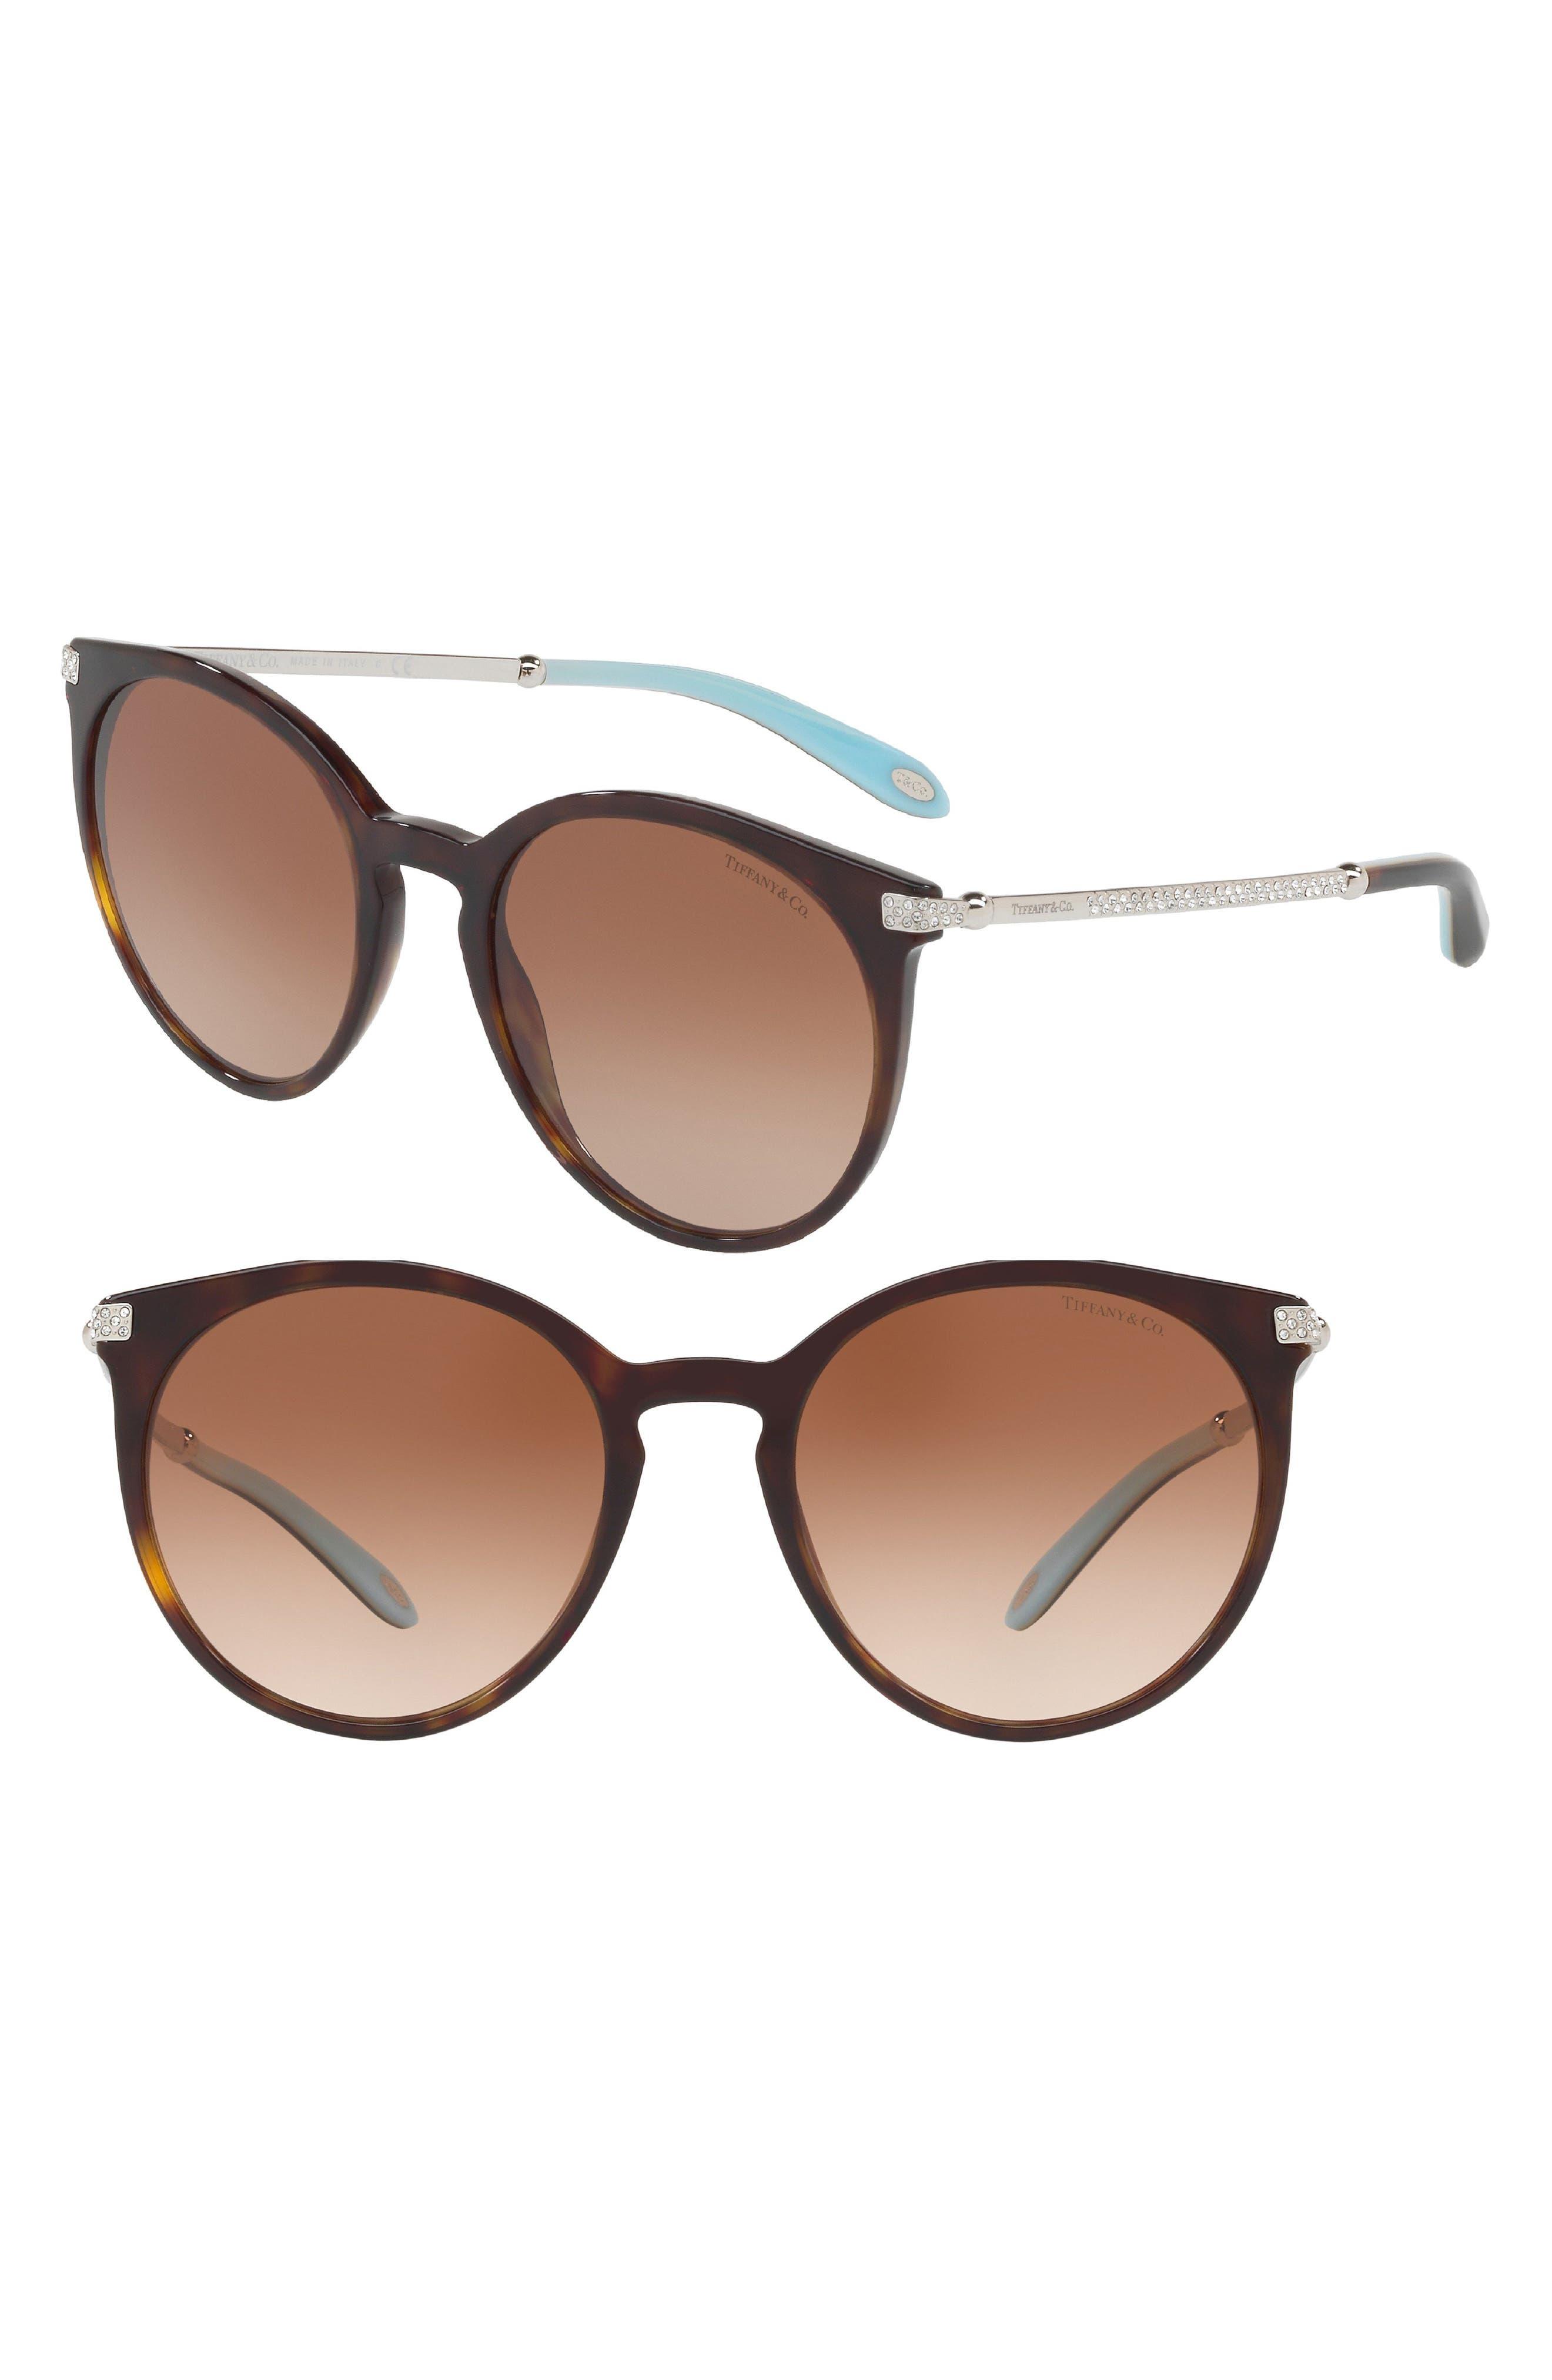 54mm Gradient Round Sunglasses,                         Main,                         color, Dark Havana